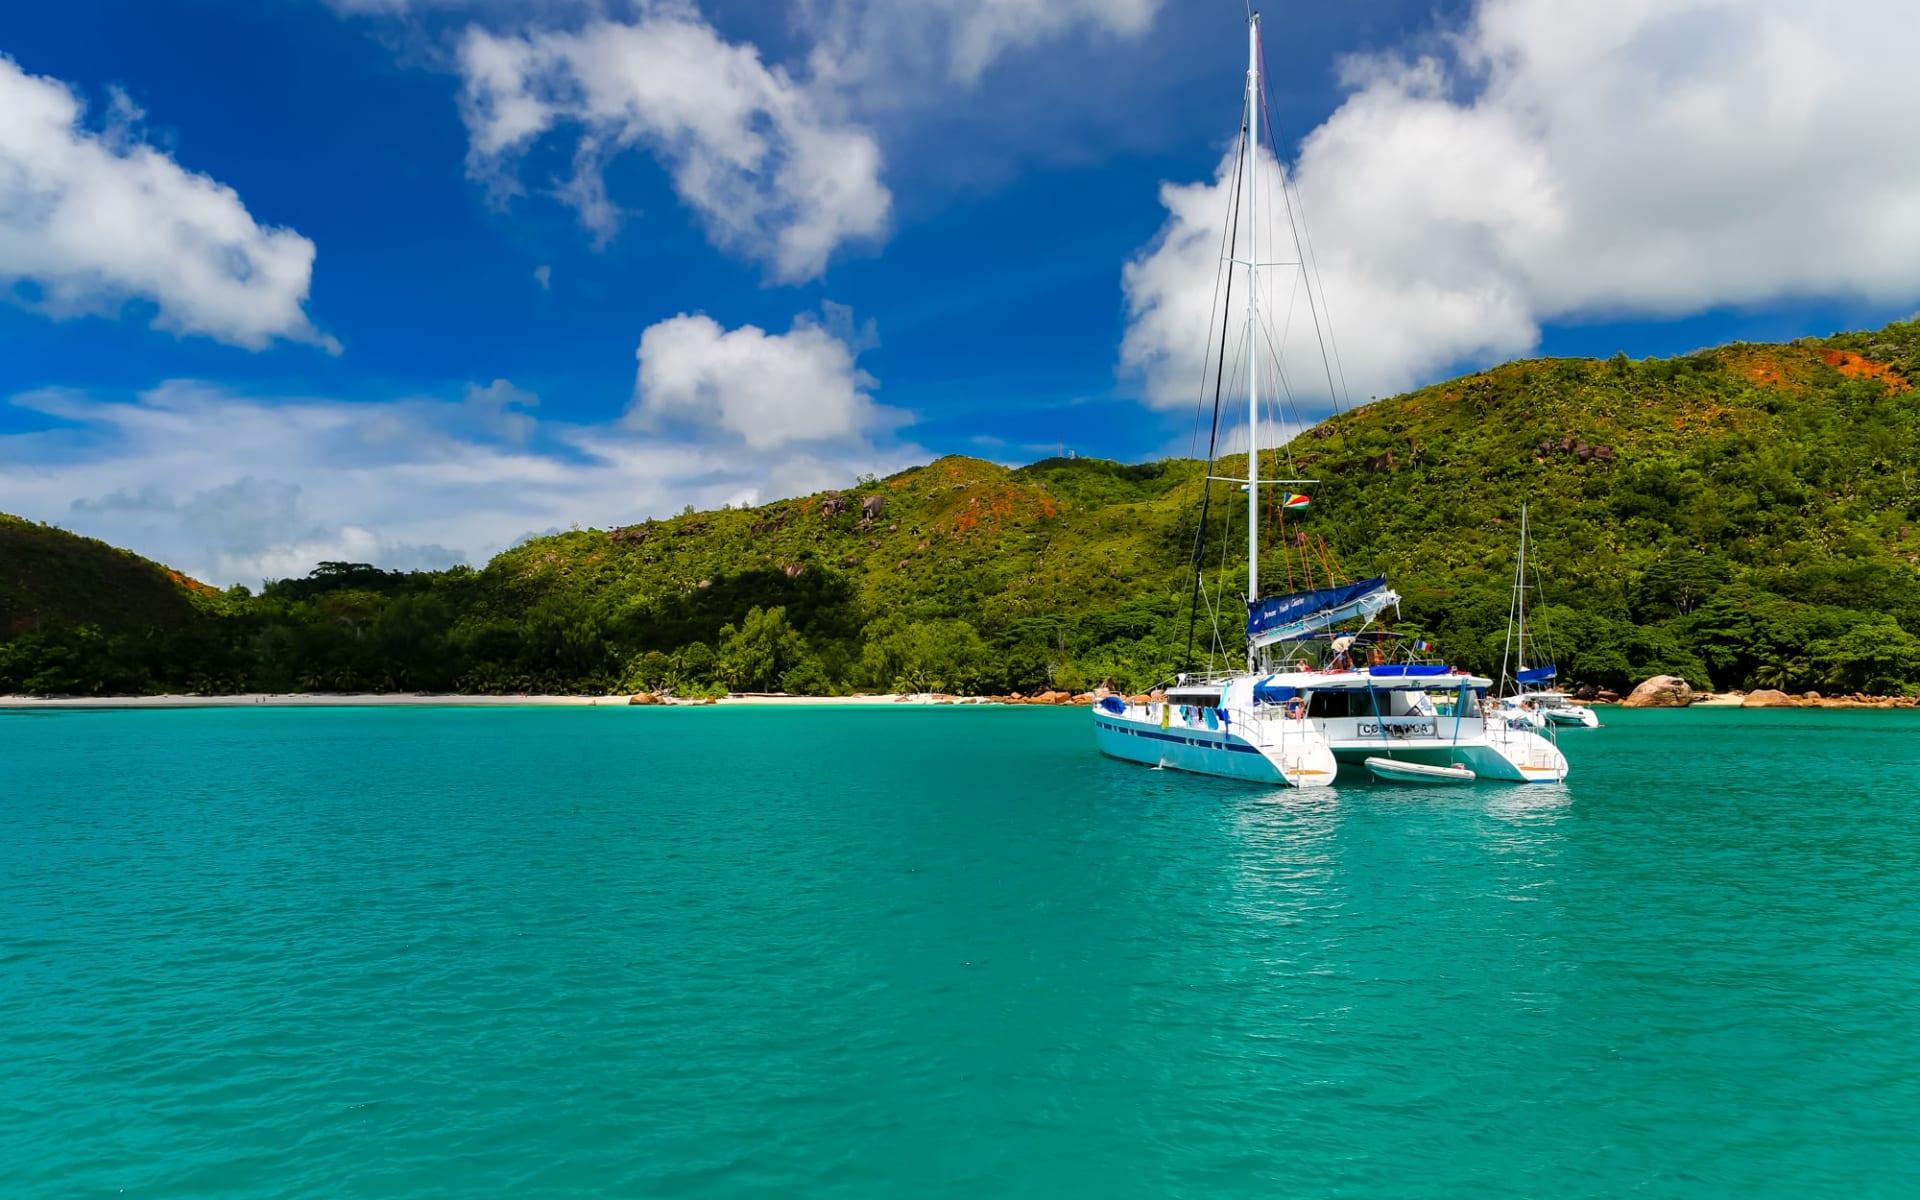 Praslin dream ab Mahé: Eleuthera 60 - Seychelles (113)